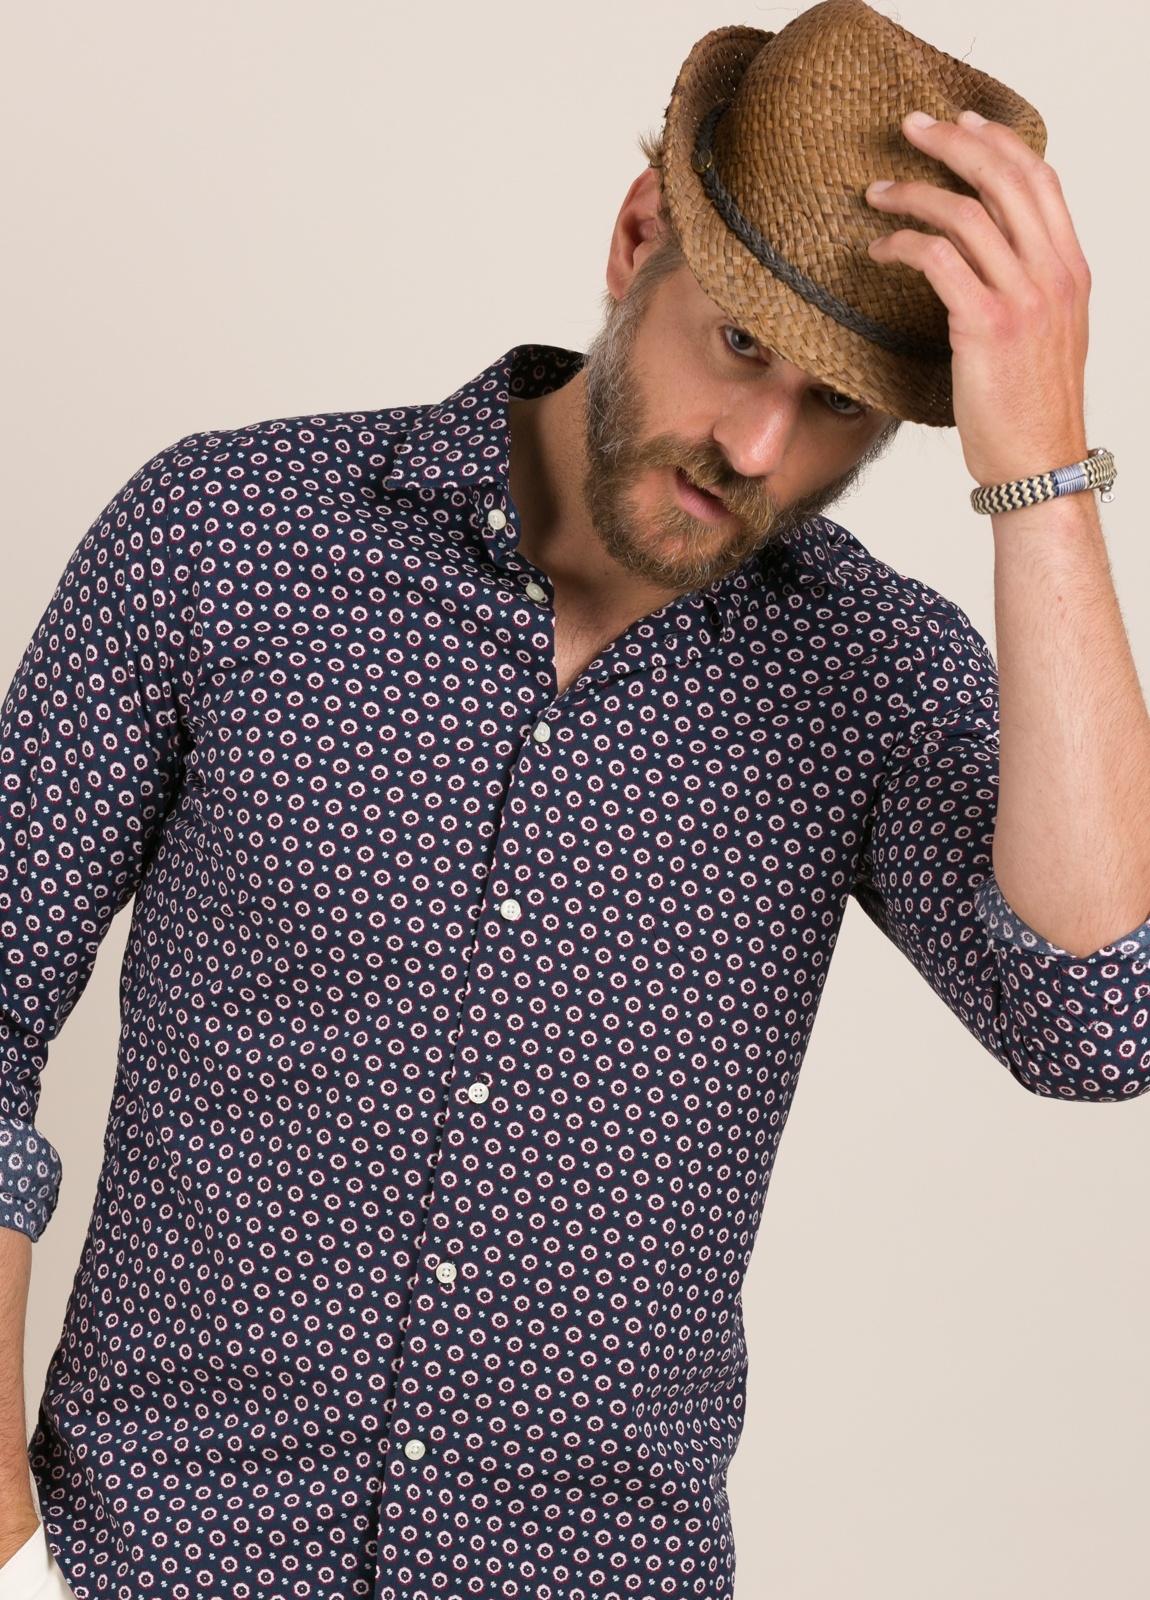 Camisa Casual Wear FUREST COLECCIÓN slim fit dibujo geométrico - Ítem1